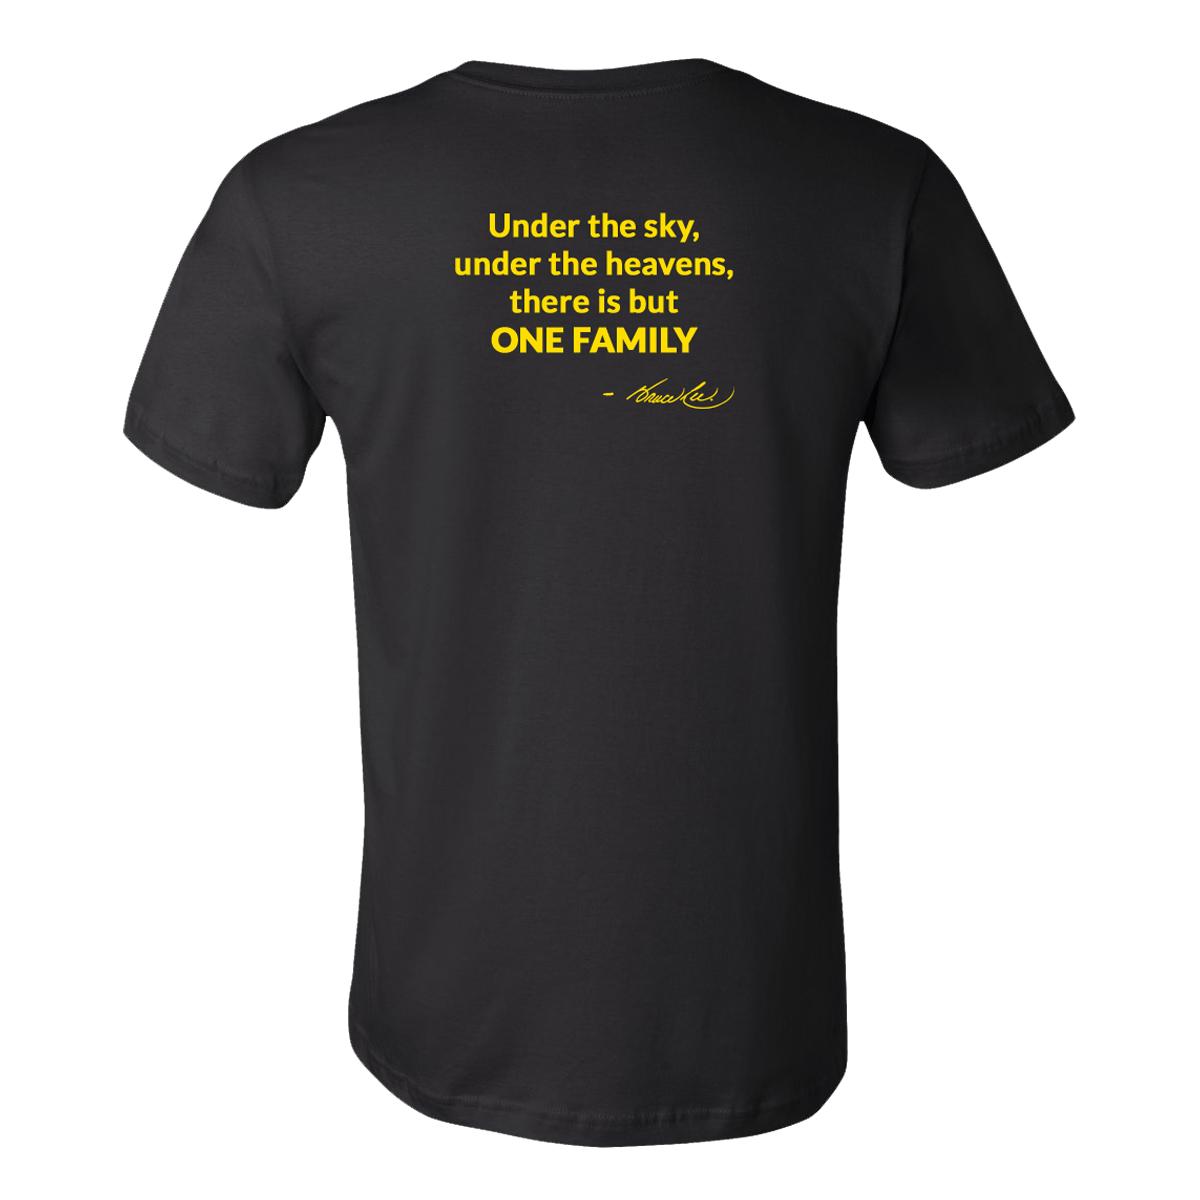 One Family Bruce Image T-shirt